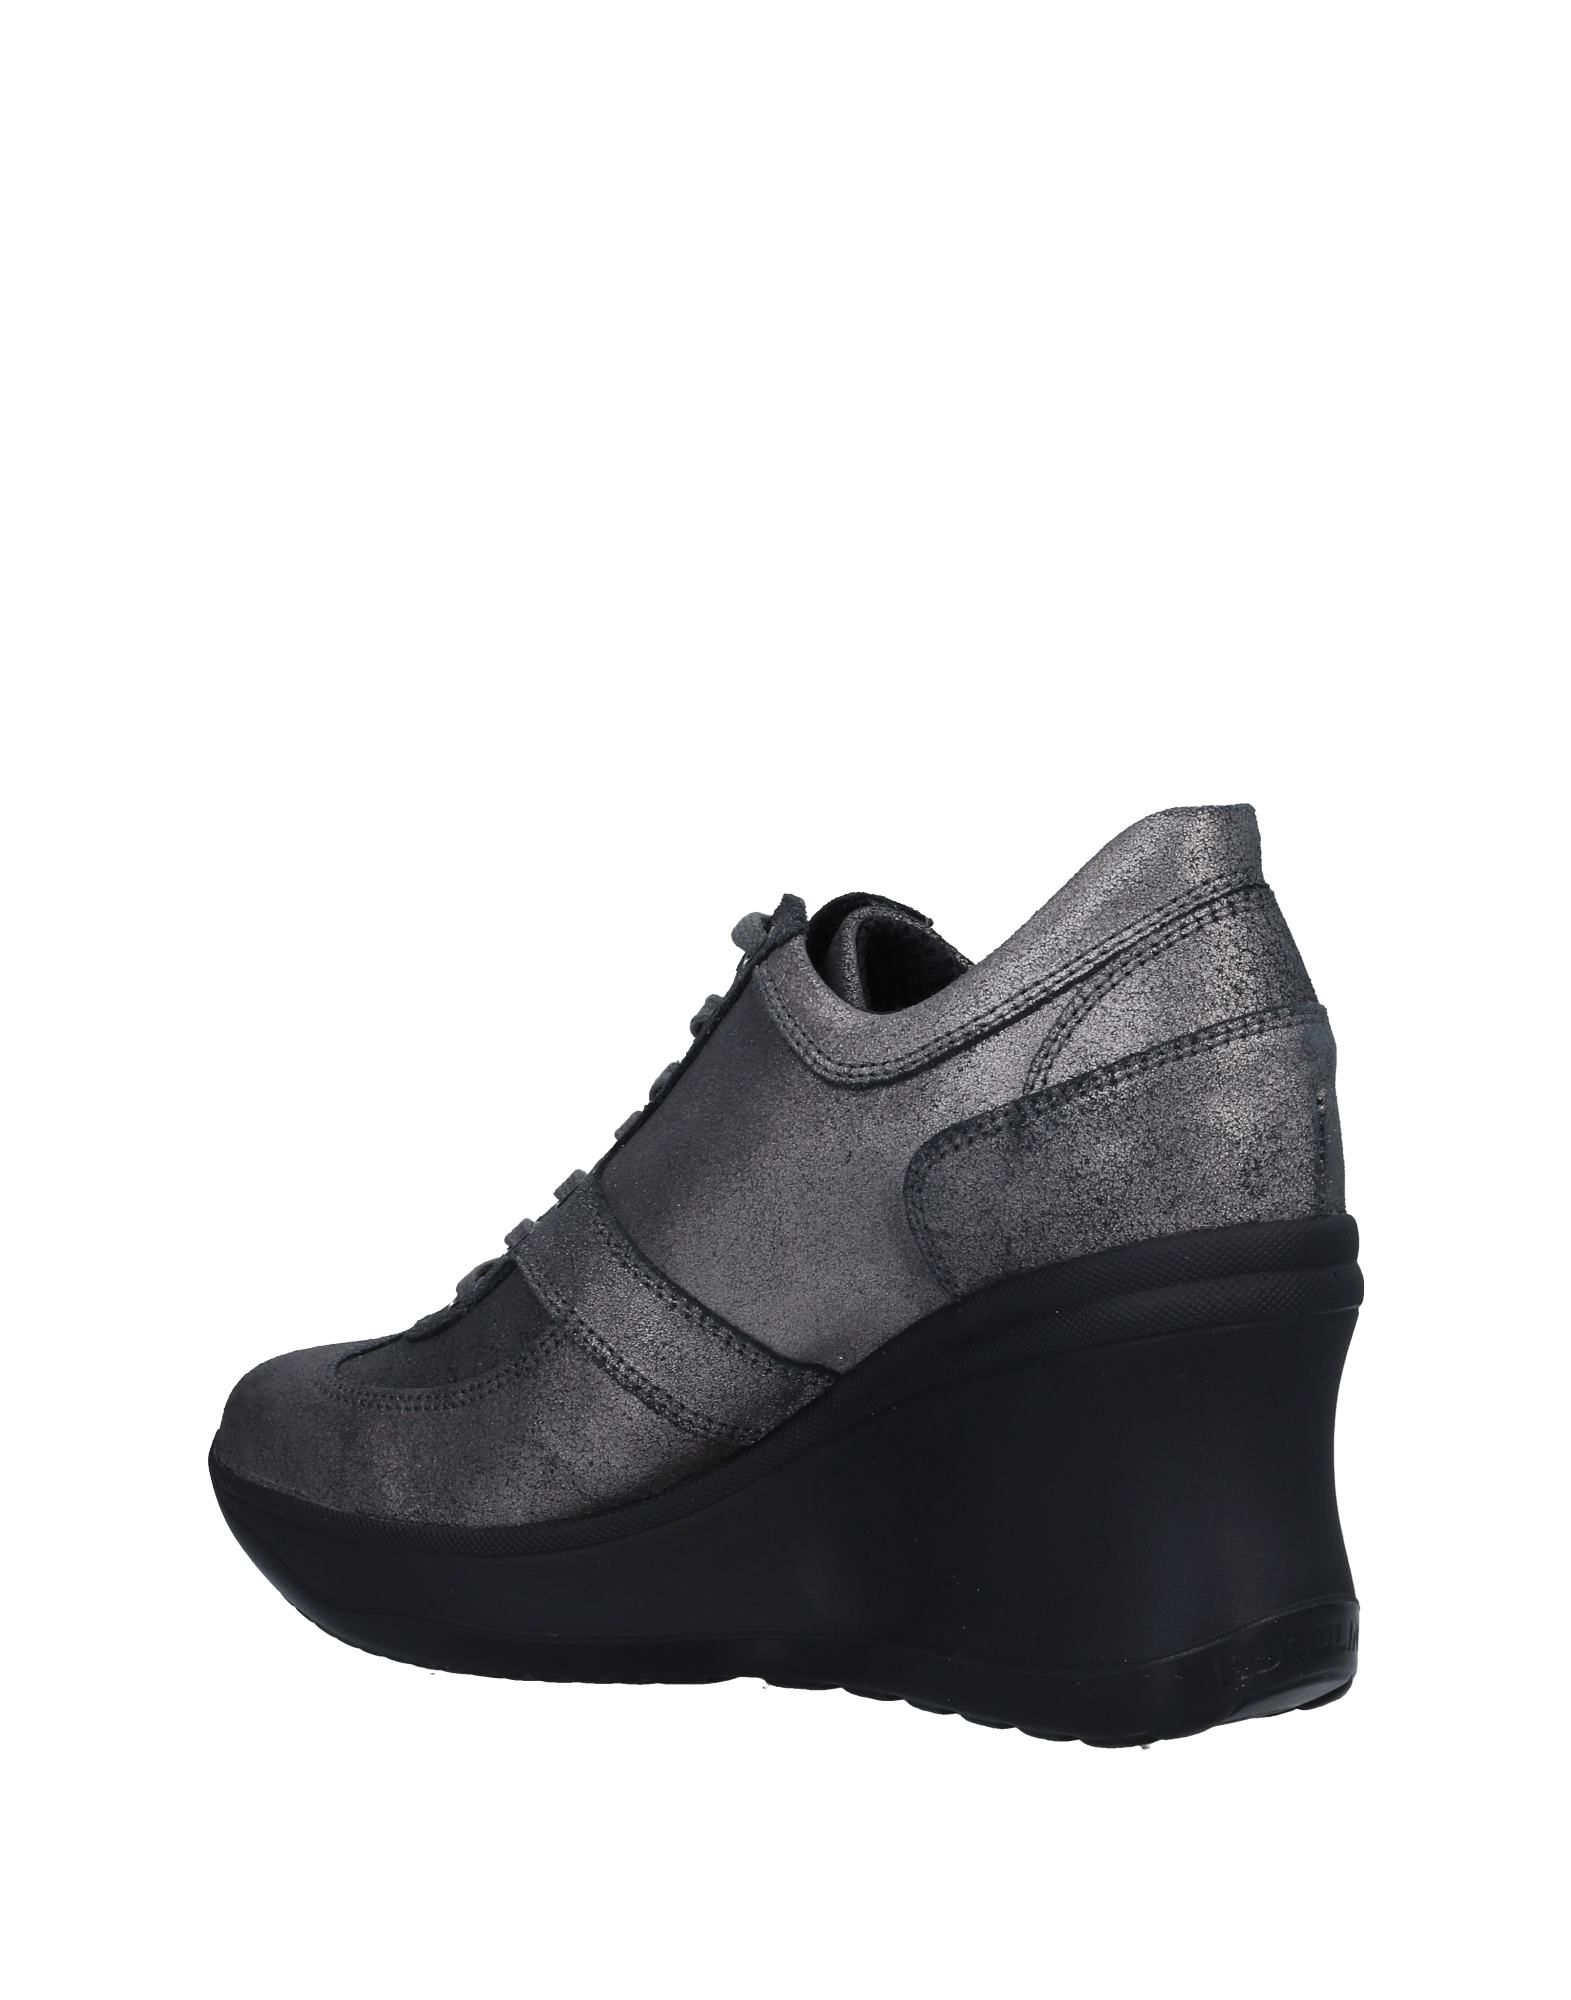 Agile By Rucoline Sneakers Damen  11495876BV Gute Qualität beliebte Schuhe Schuhe beliebte 7312a0